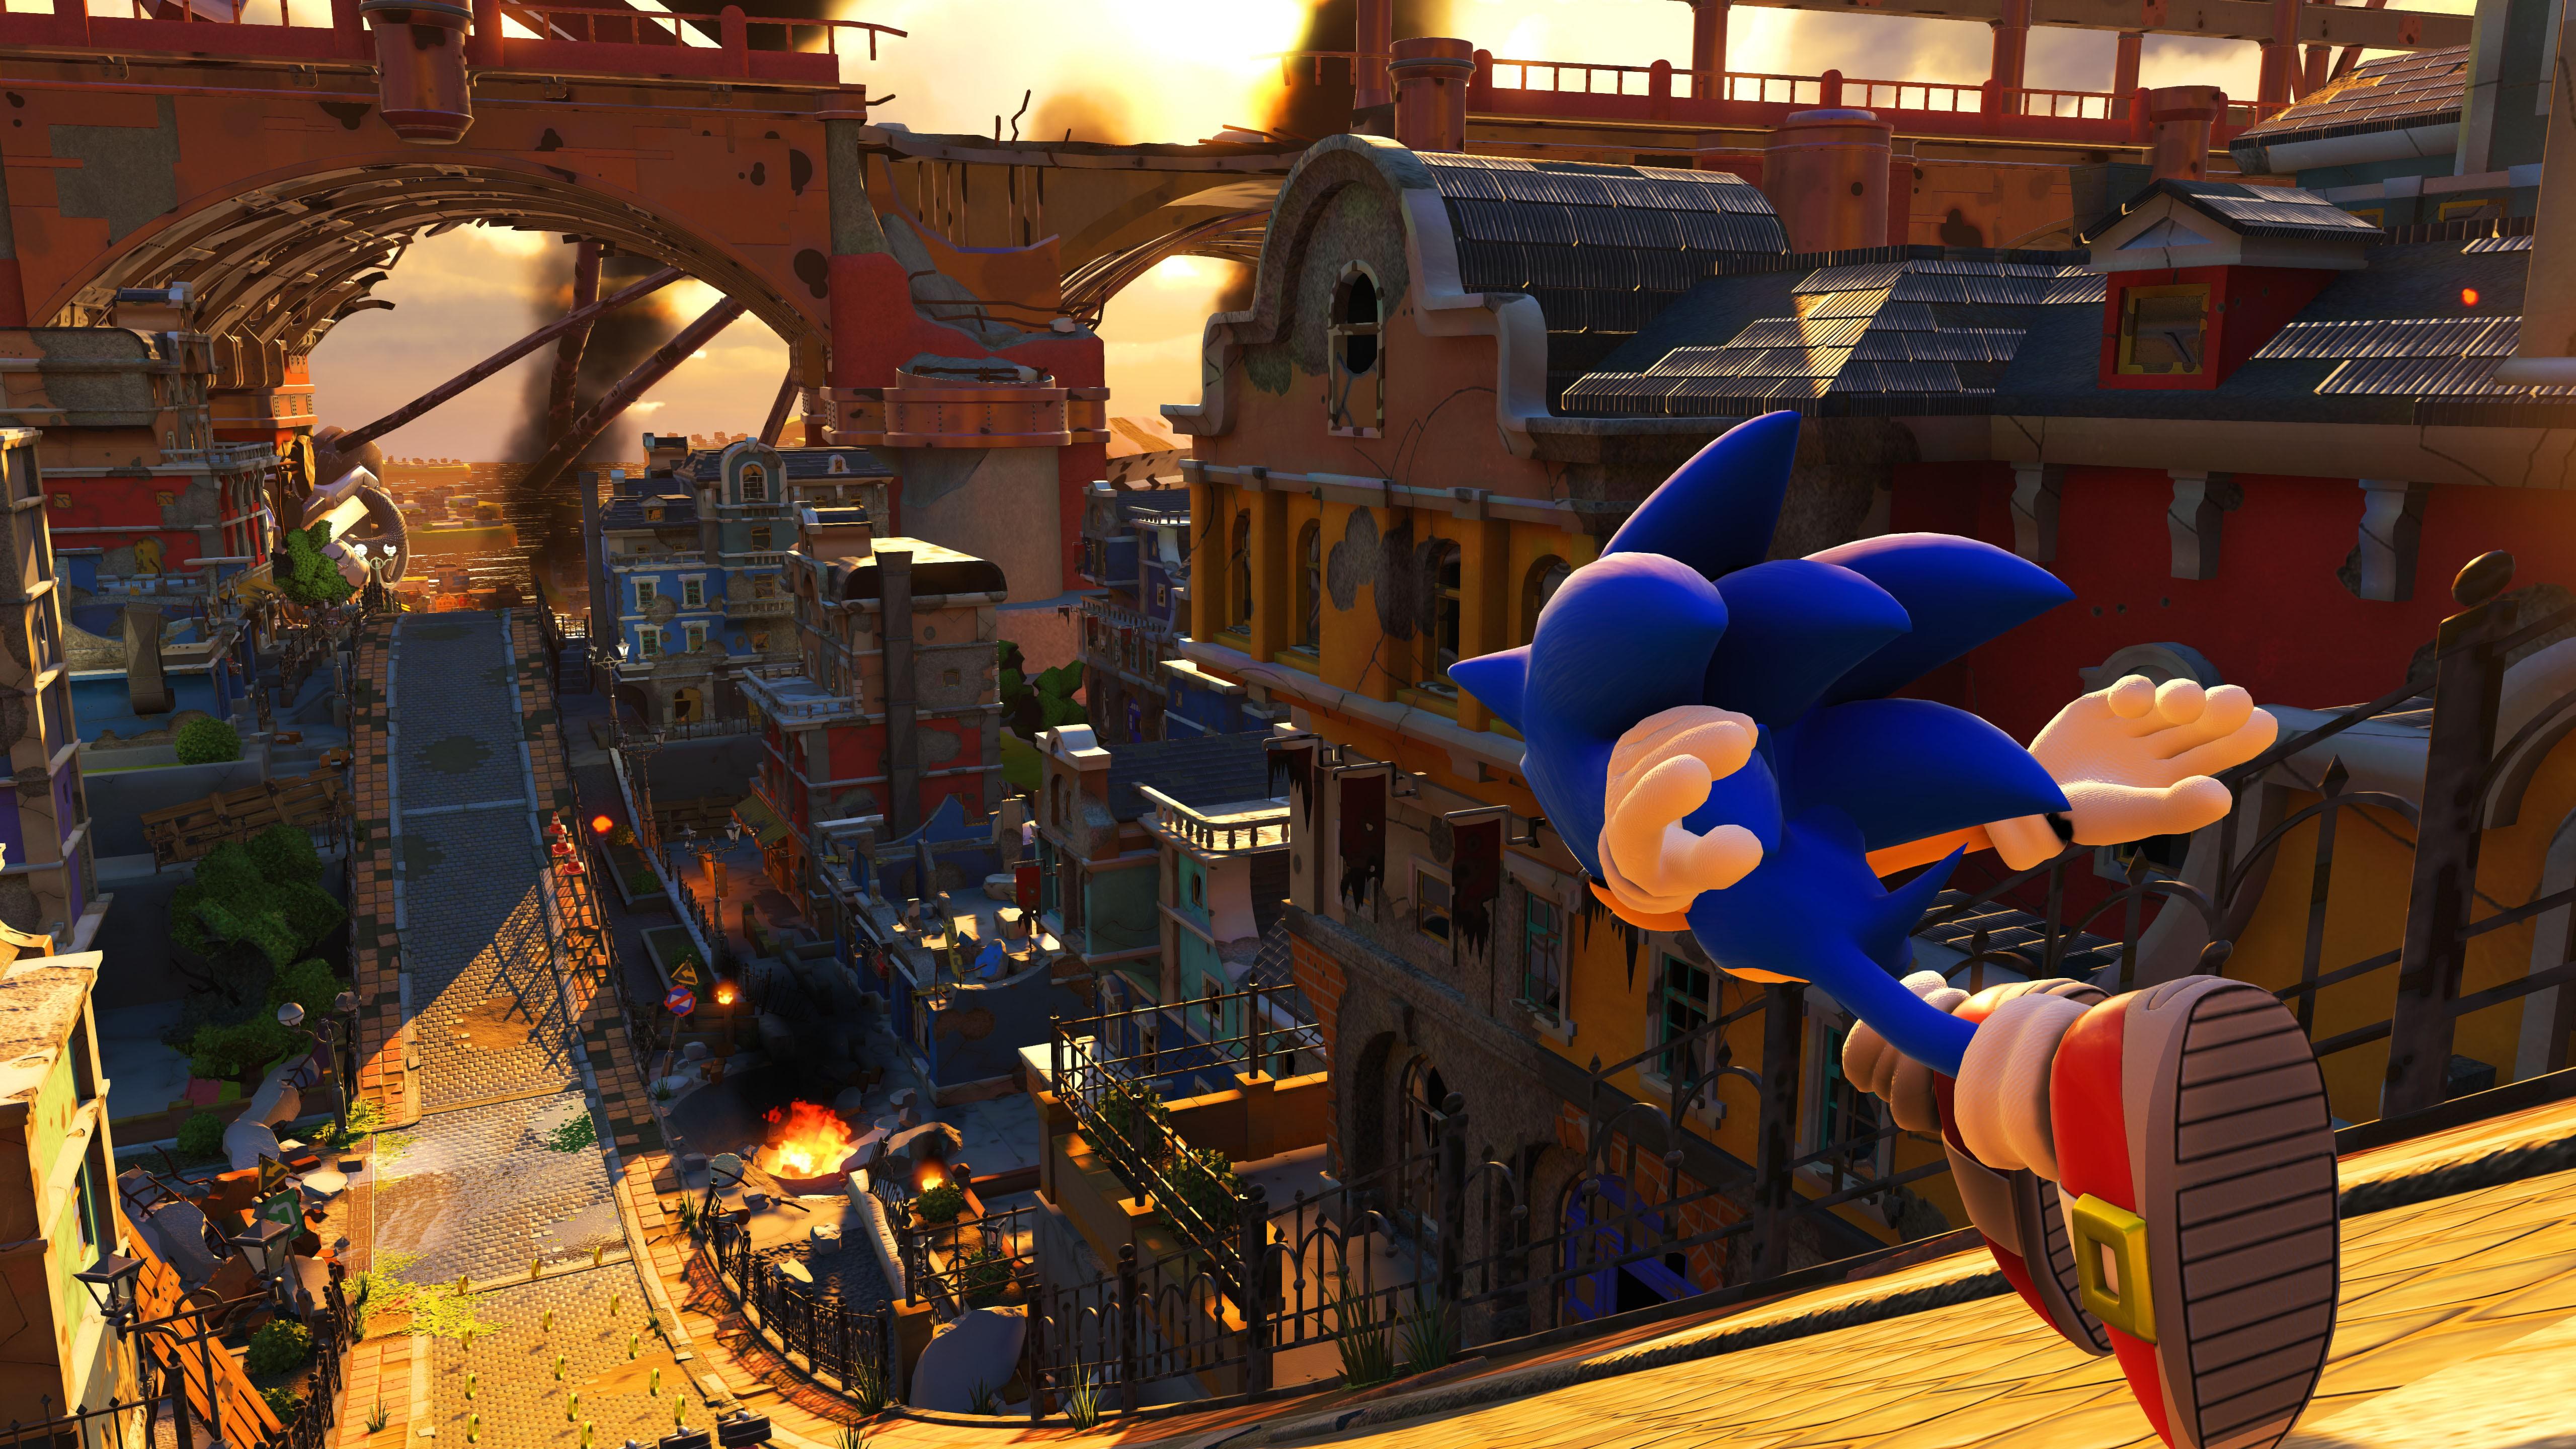 Wallpaper Sonic Forces, 4k, E3 2017, screenshot, Games #14363